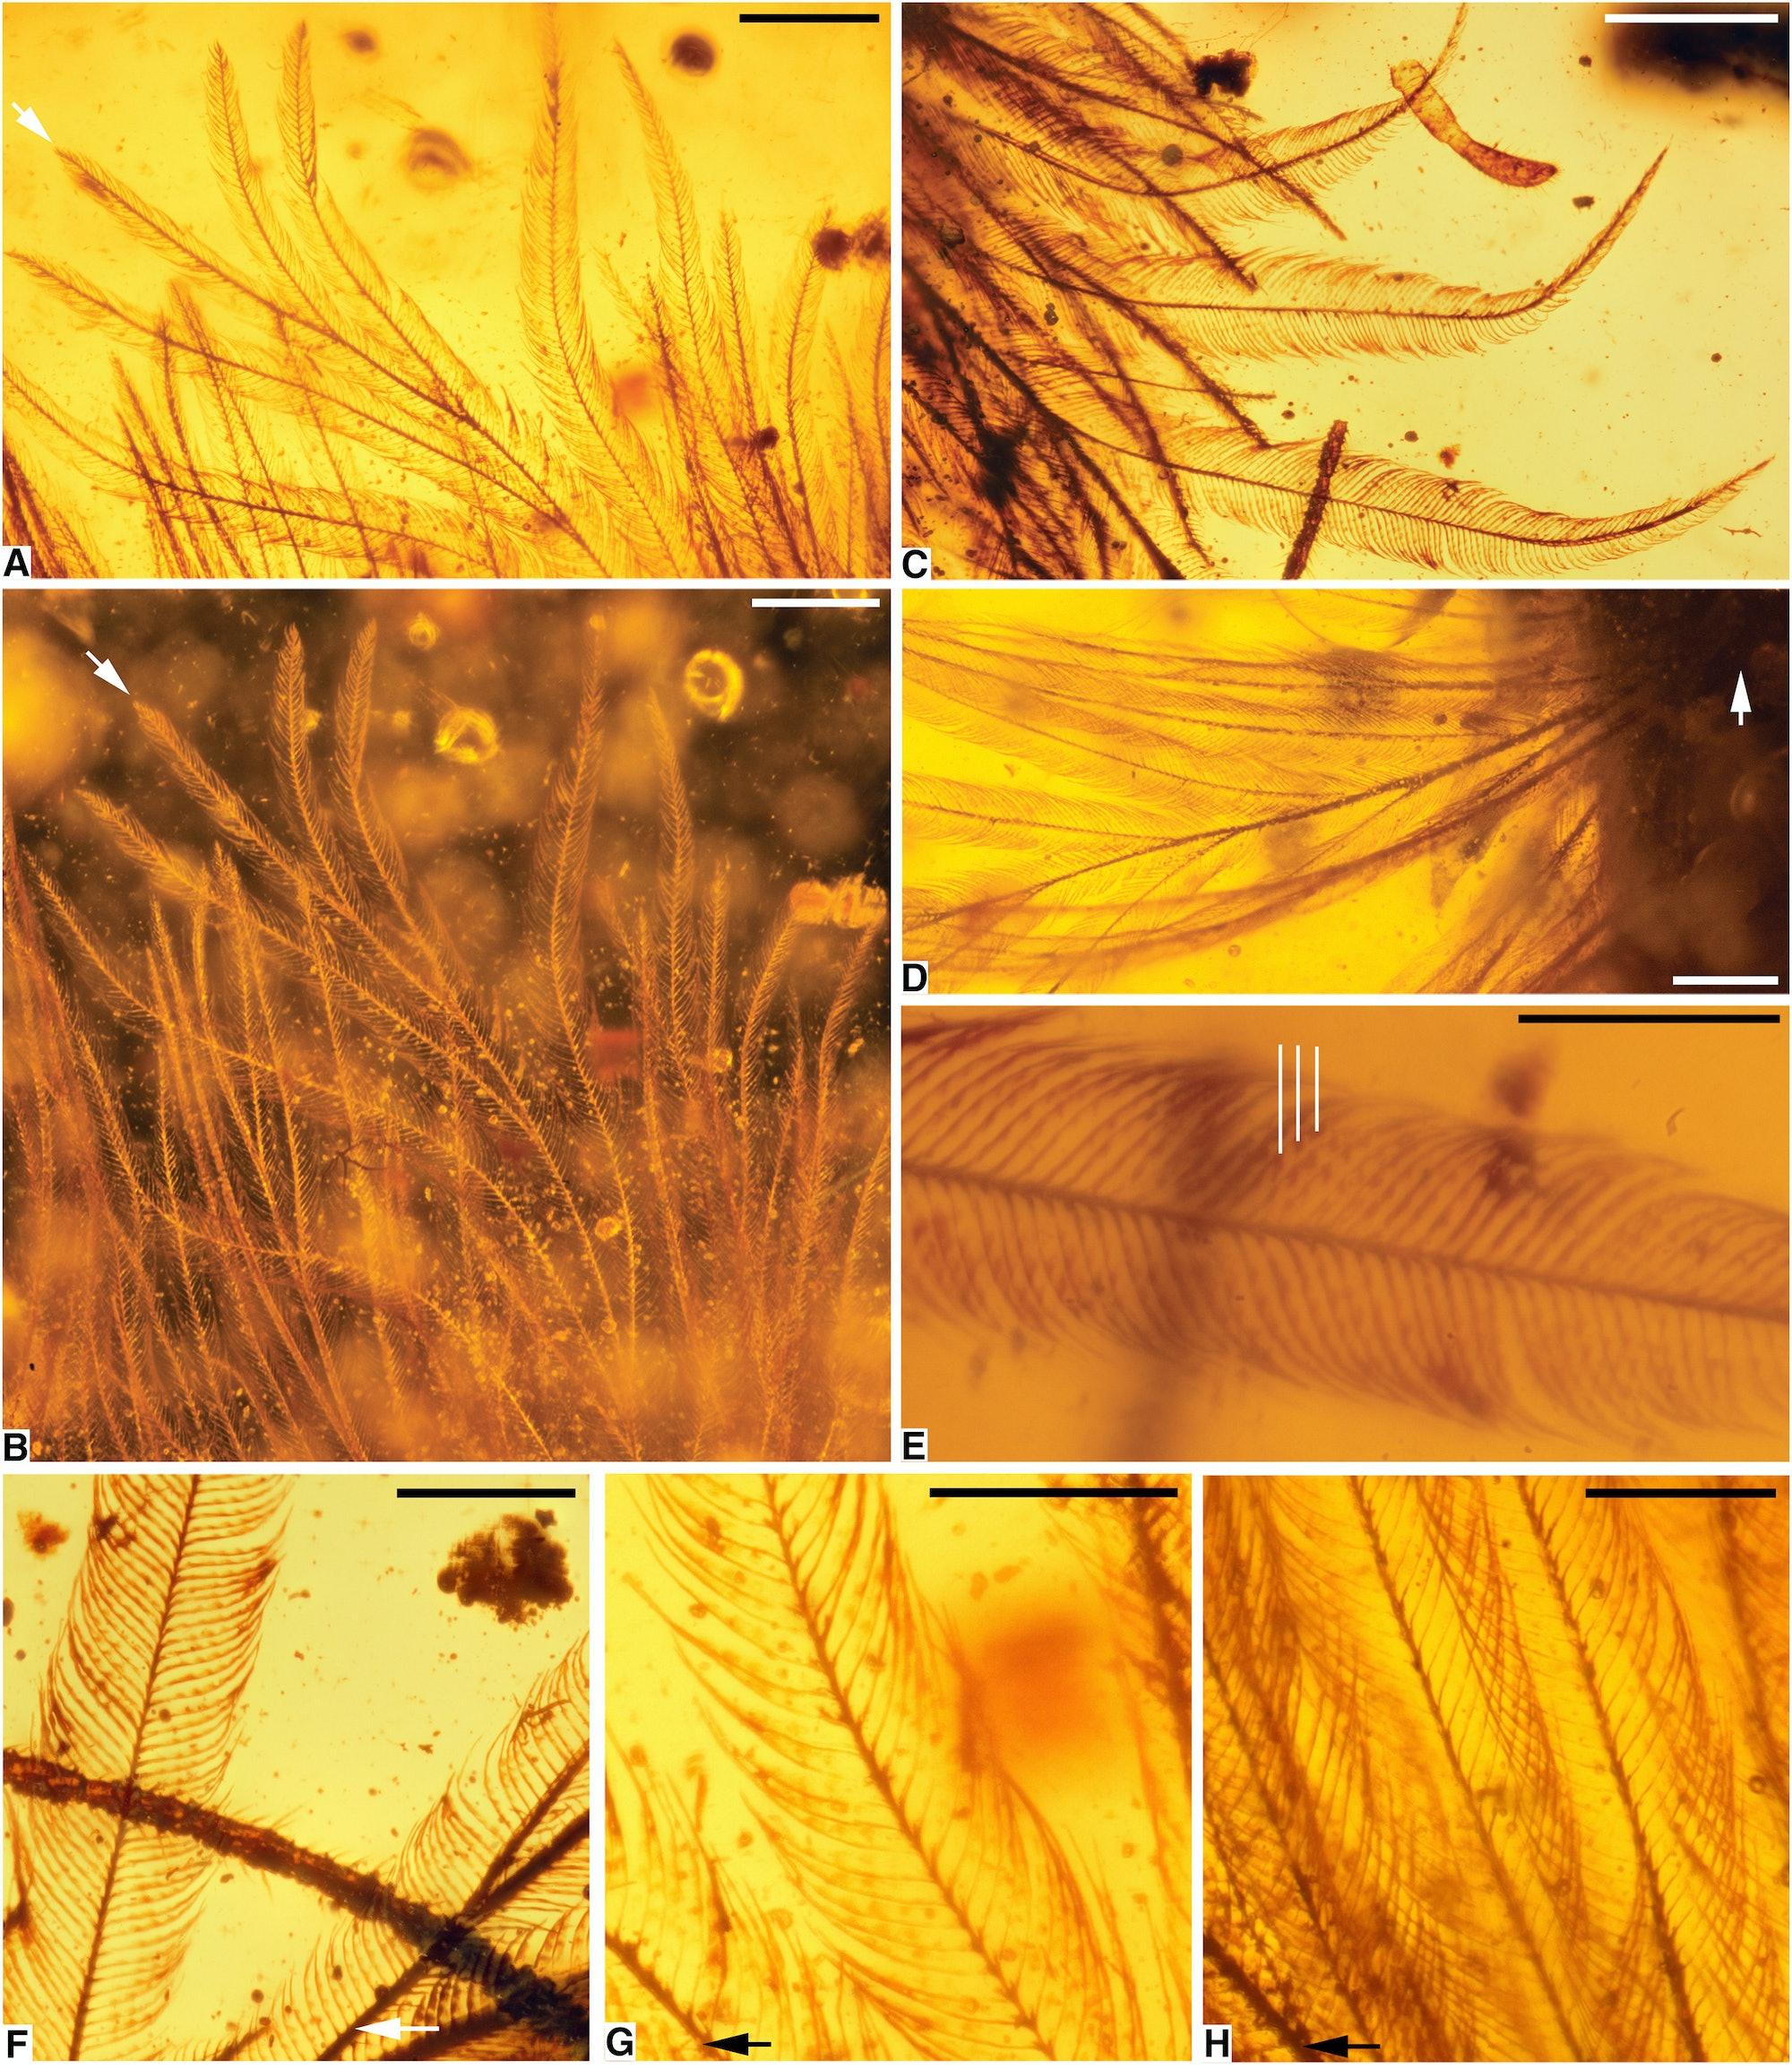 Photomicrographs of DIP-V-15103 Plumage